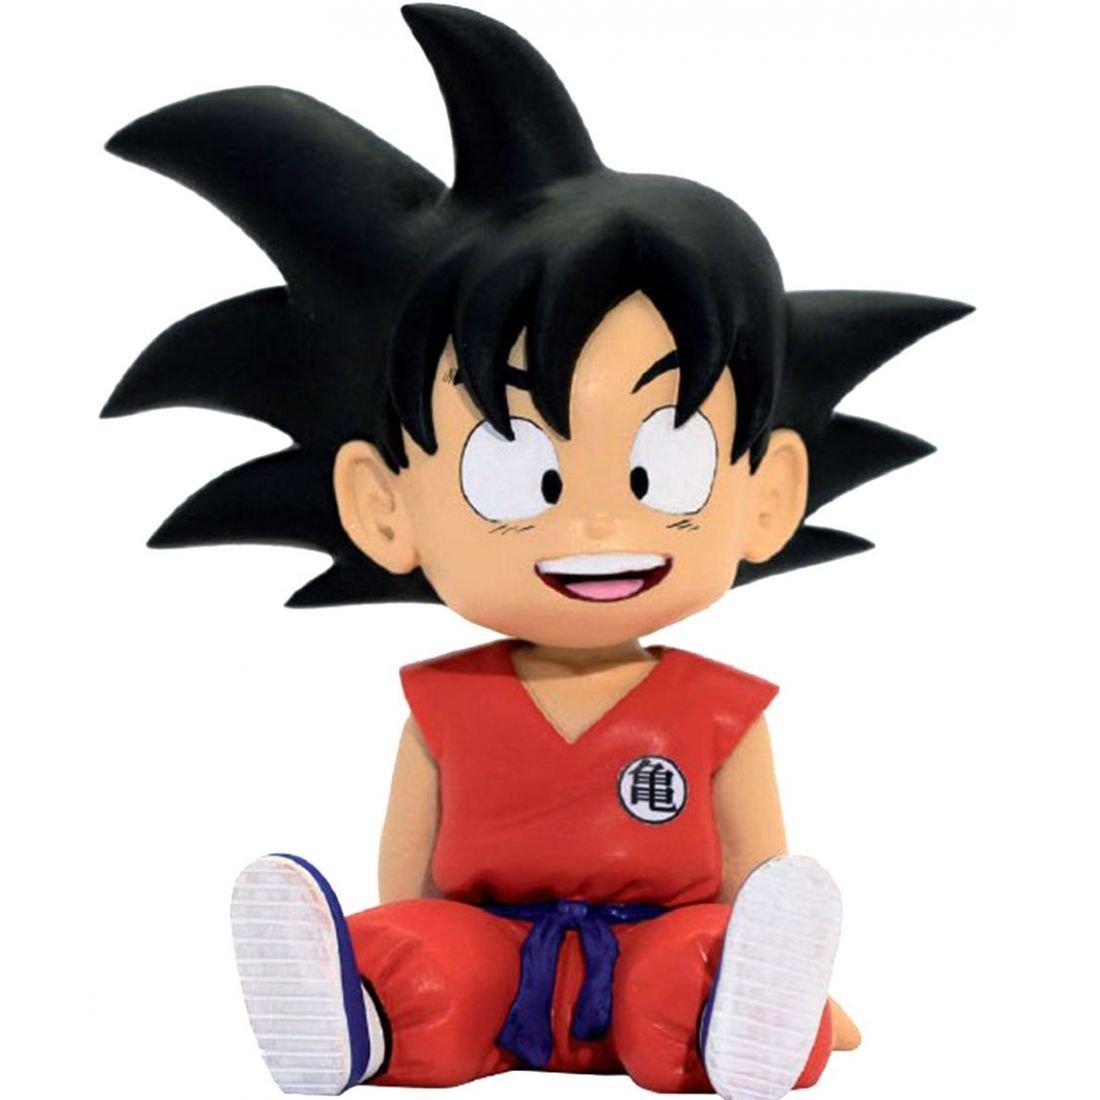 Plastoy Mini-Tirelire Dragon Ball - San Goku product image